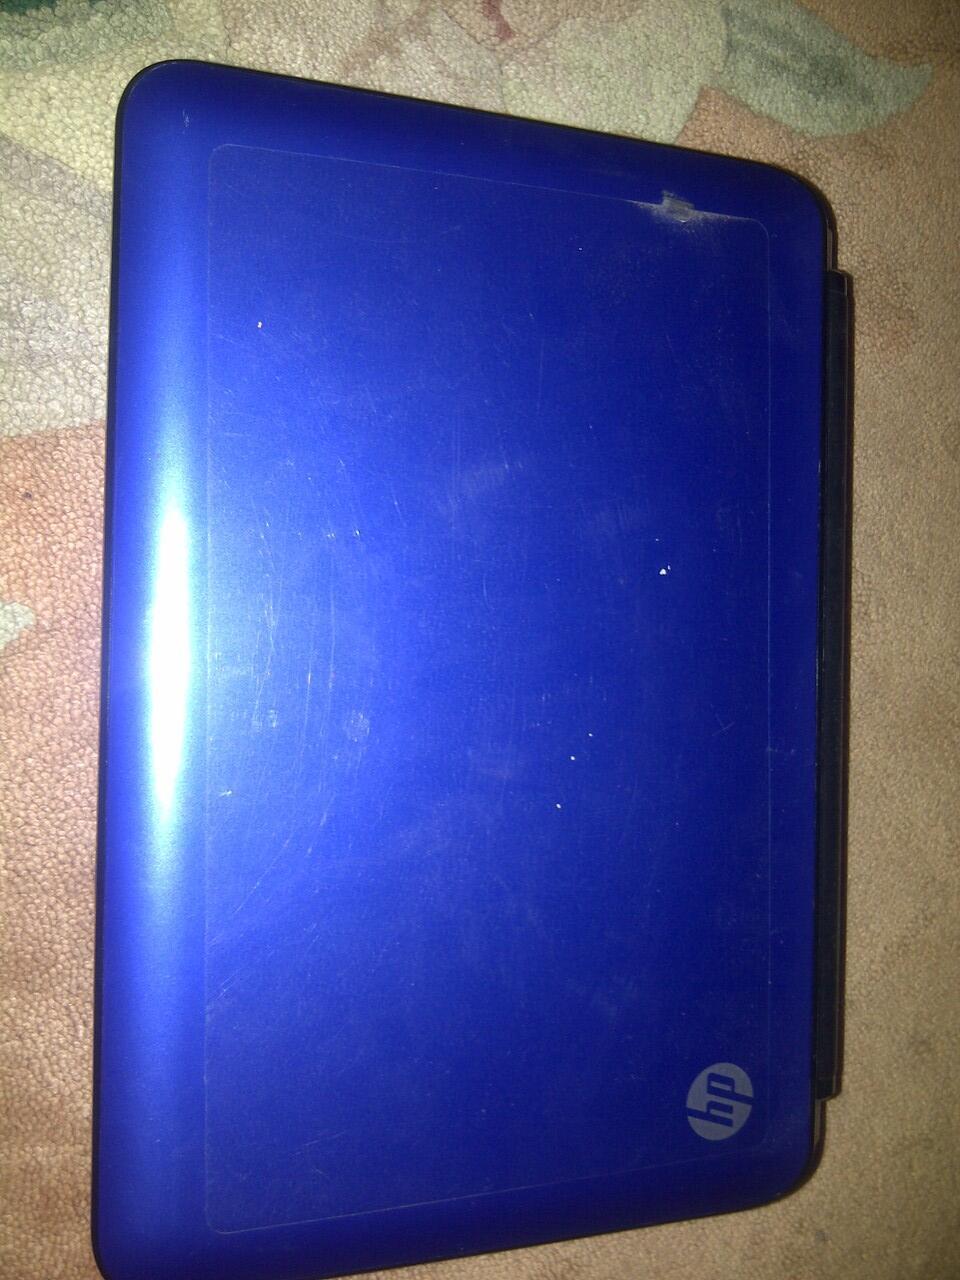 Jual HP mini 110 biru-hitam